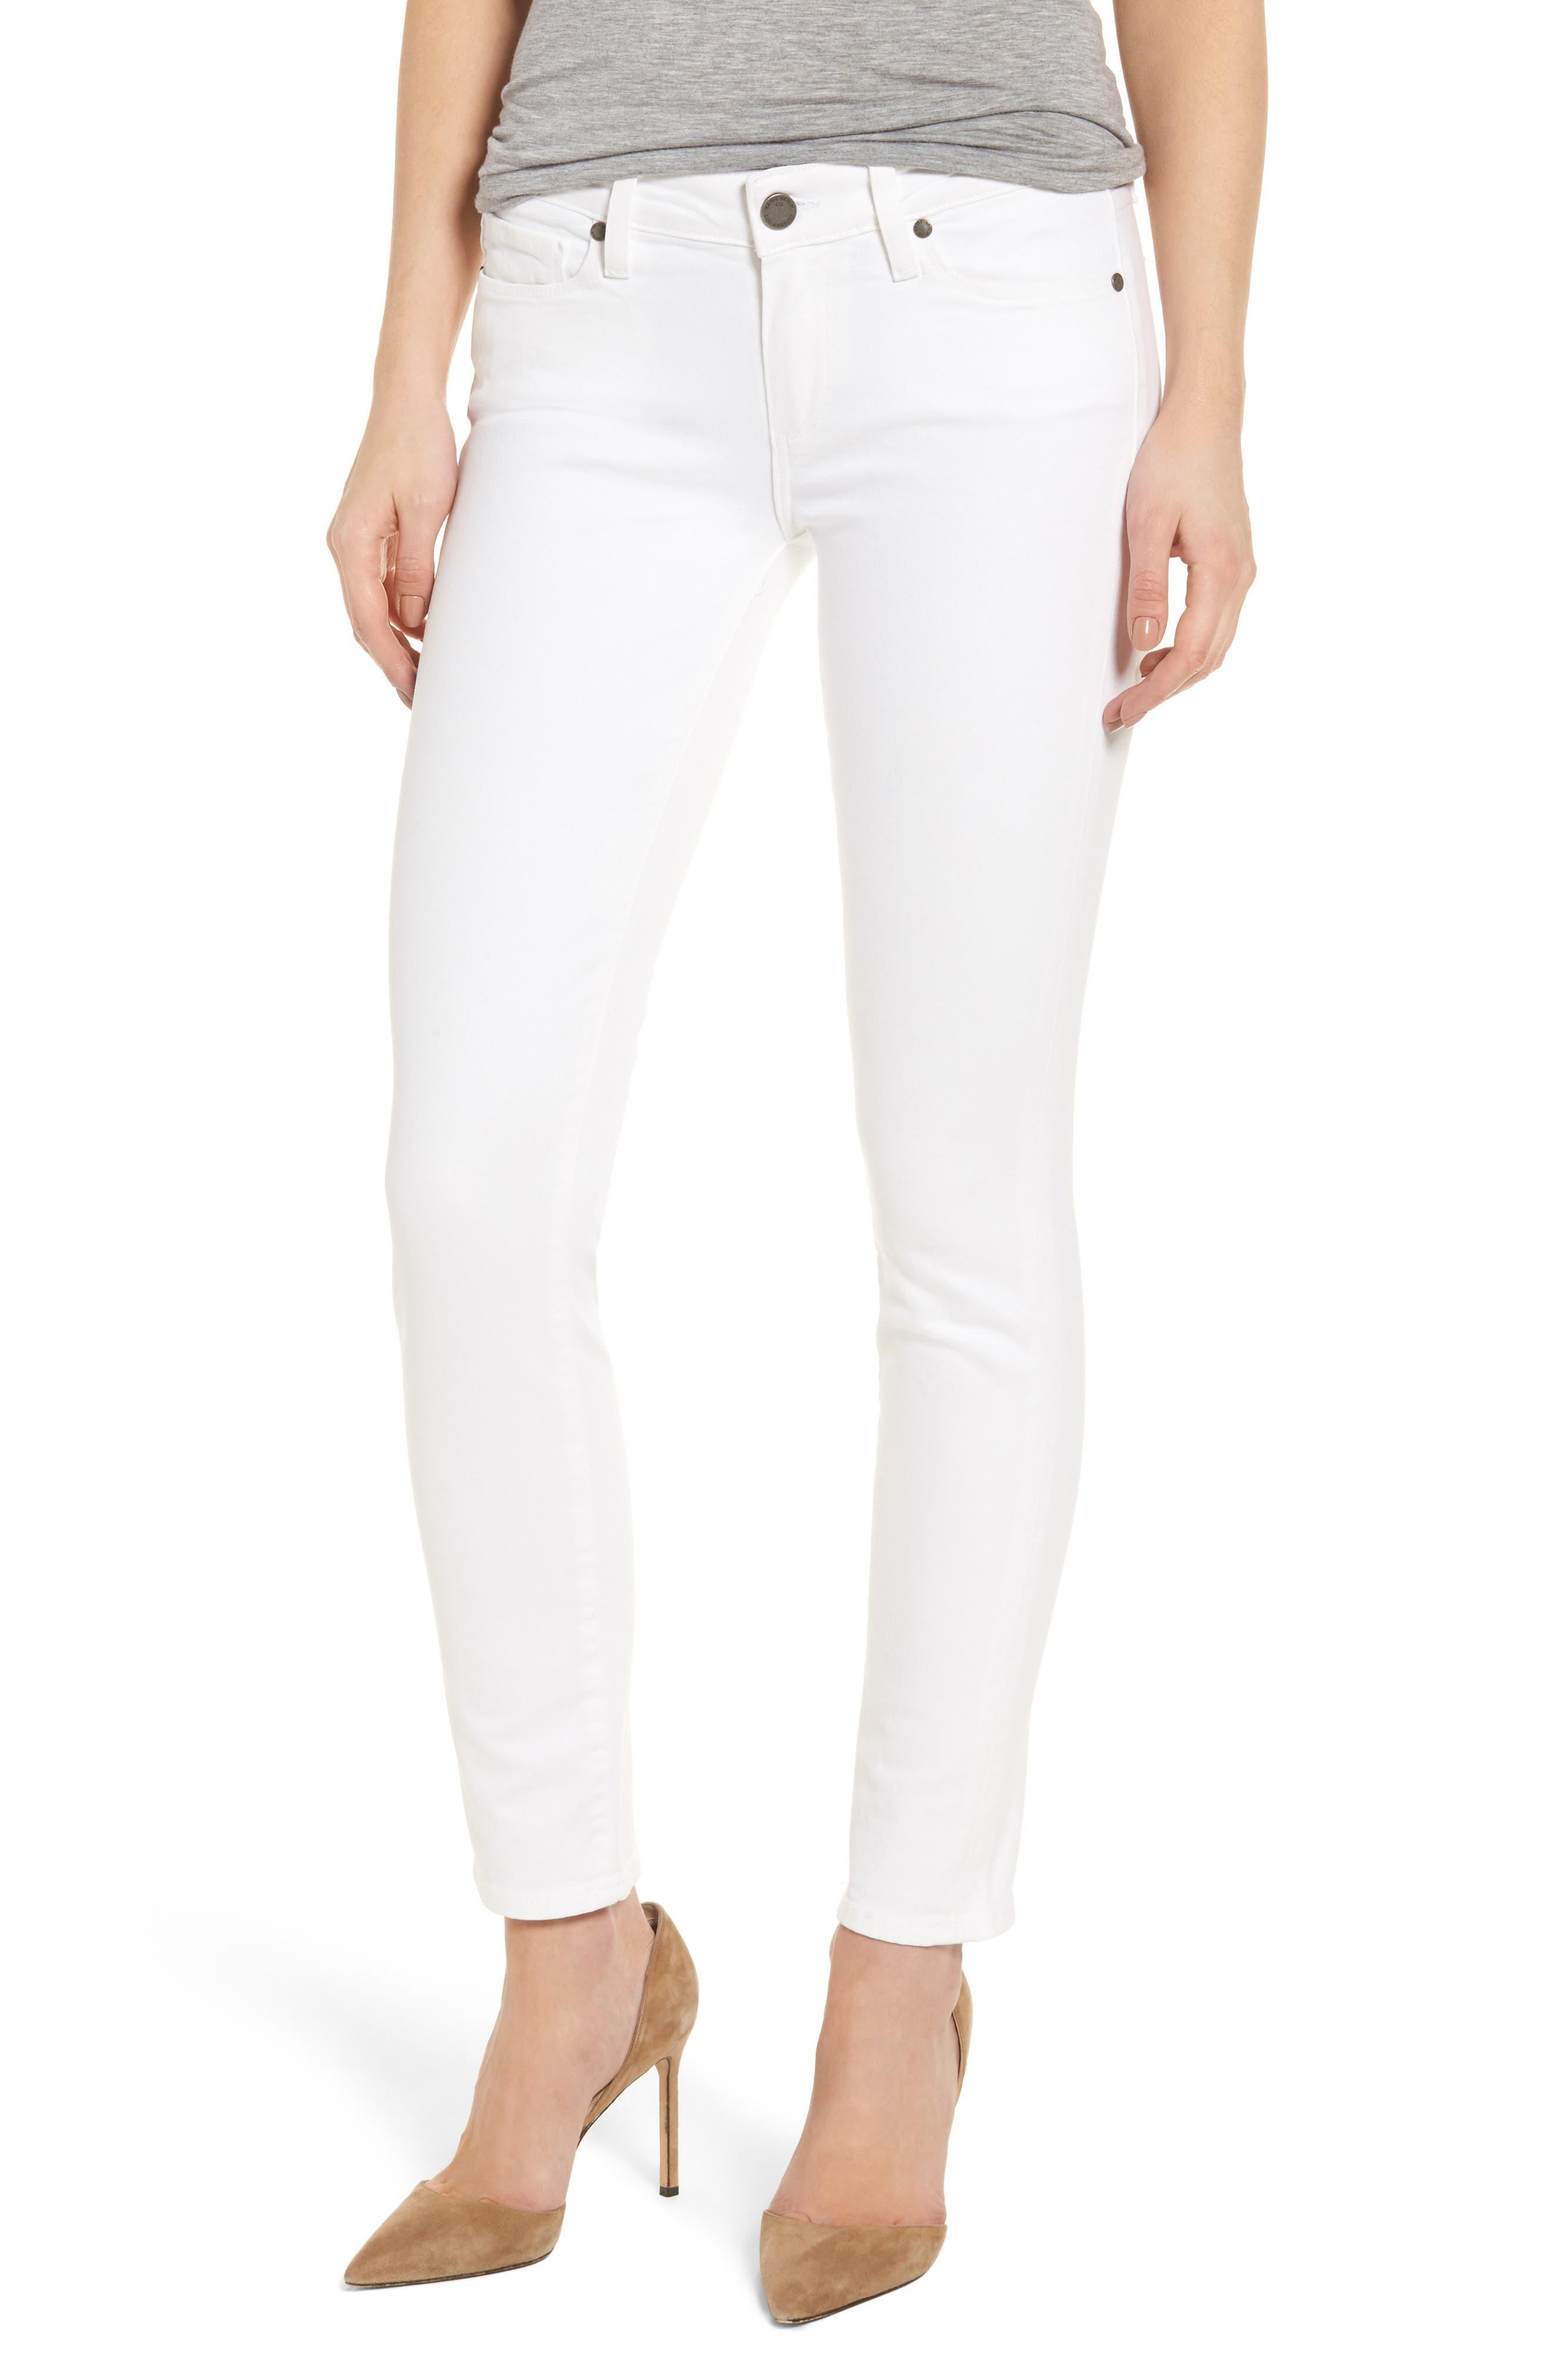 PAIGE 'Skyline' Ankle Peg Skinny Jeans, Main, color, 100